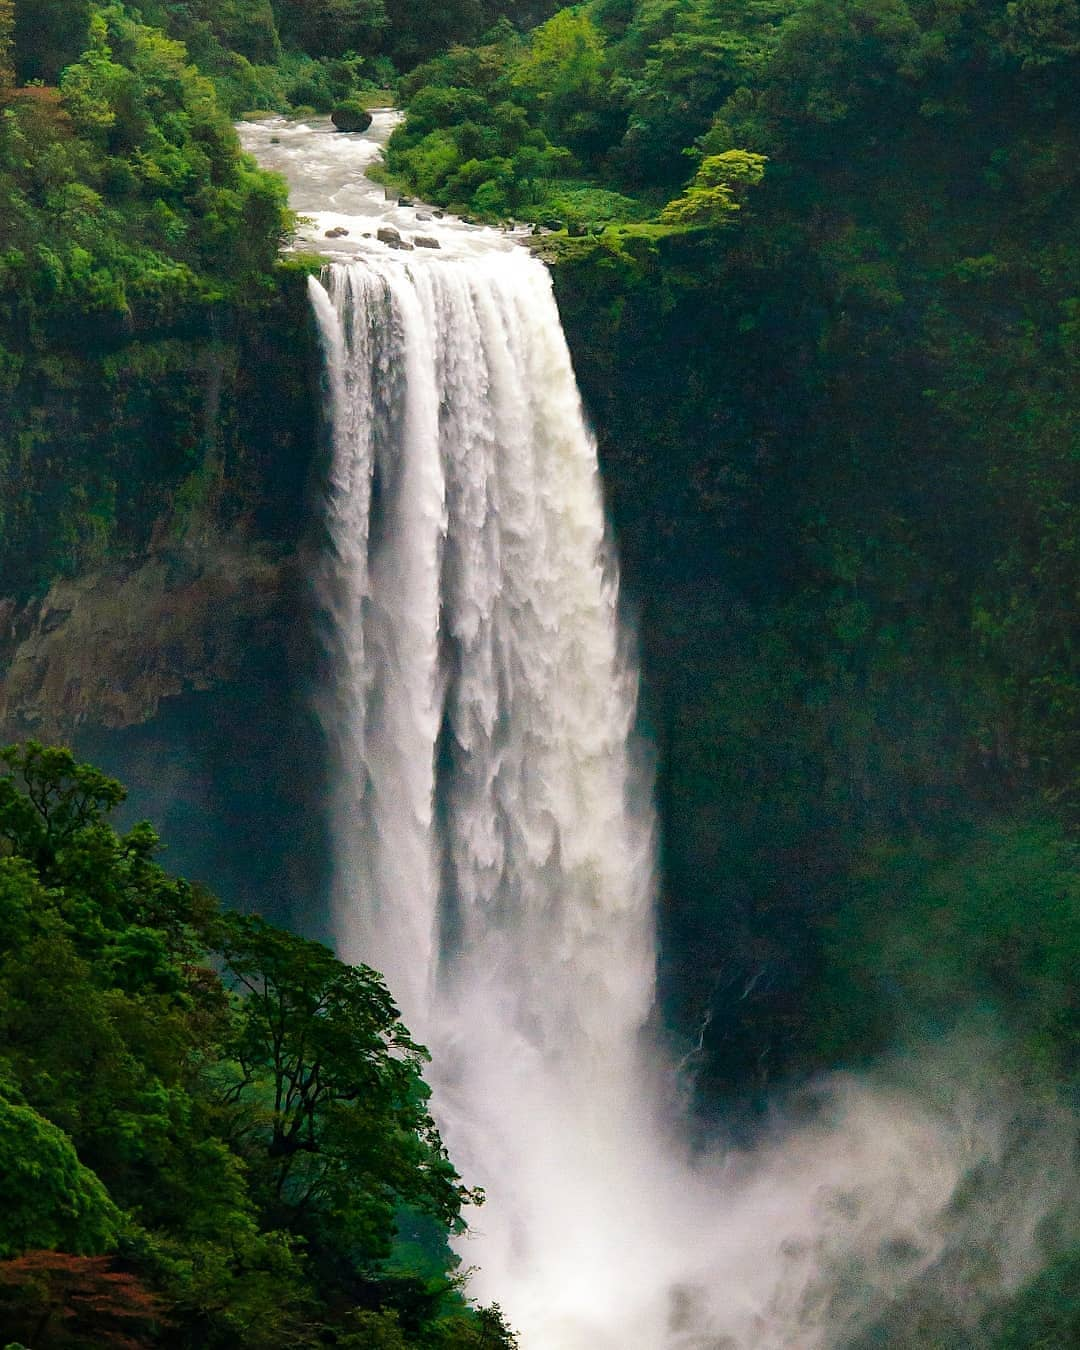 Tambdi Surla Waterfall